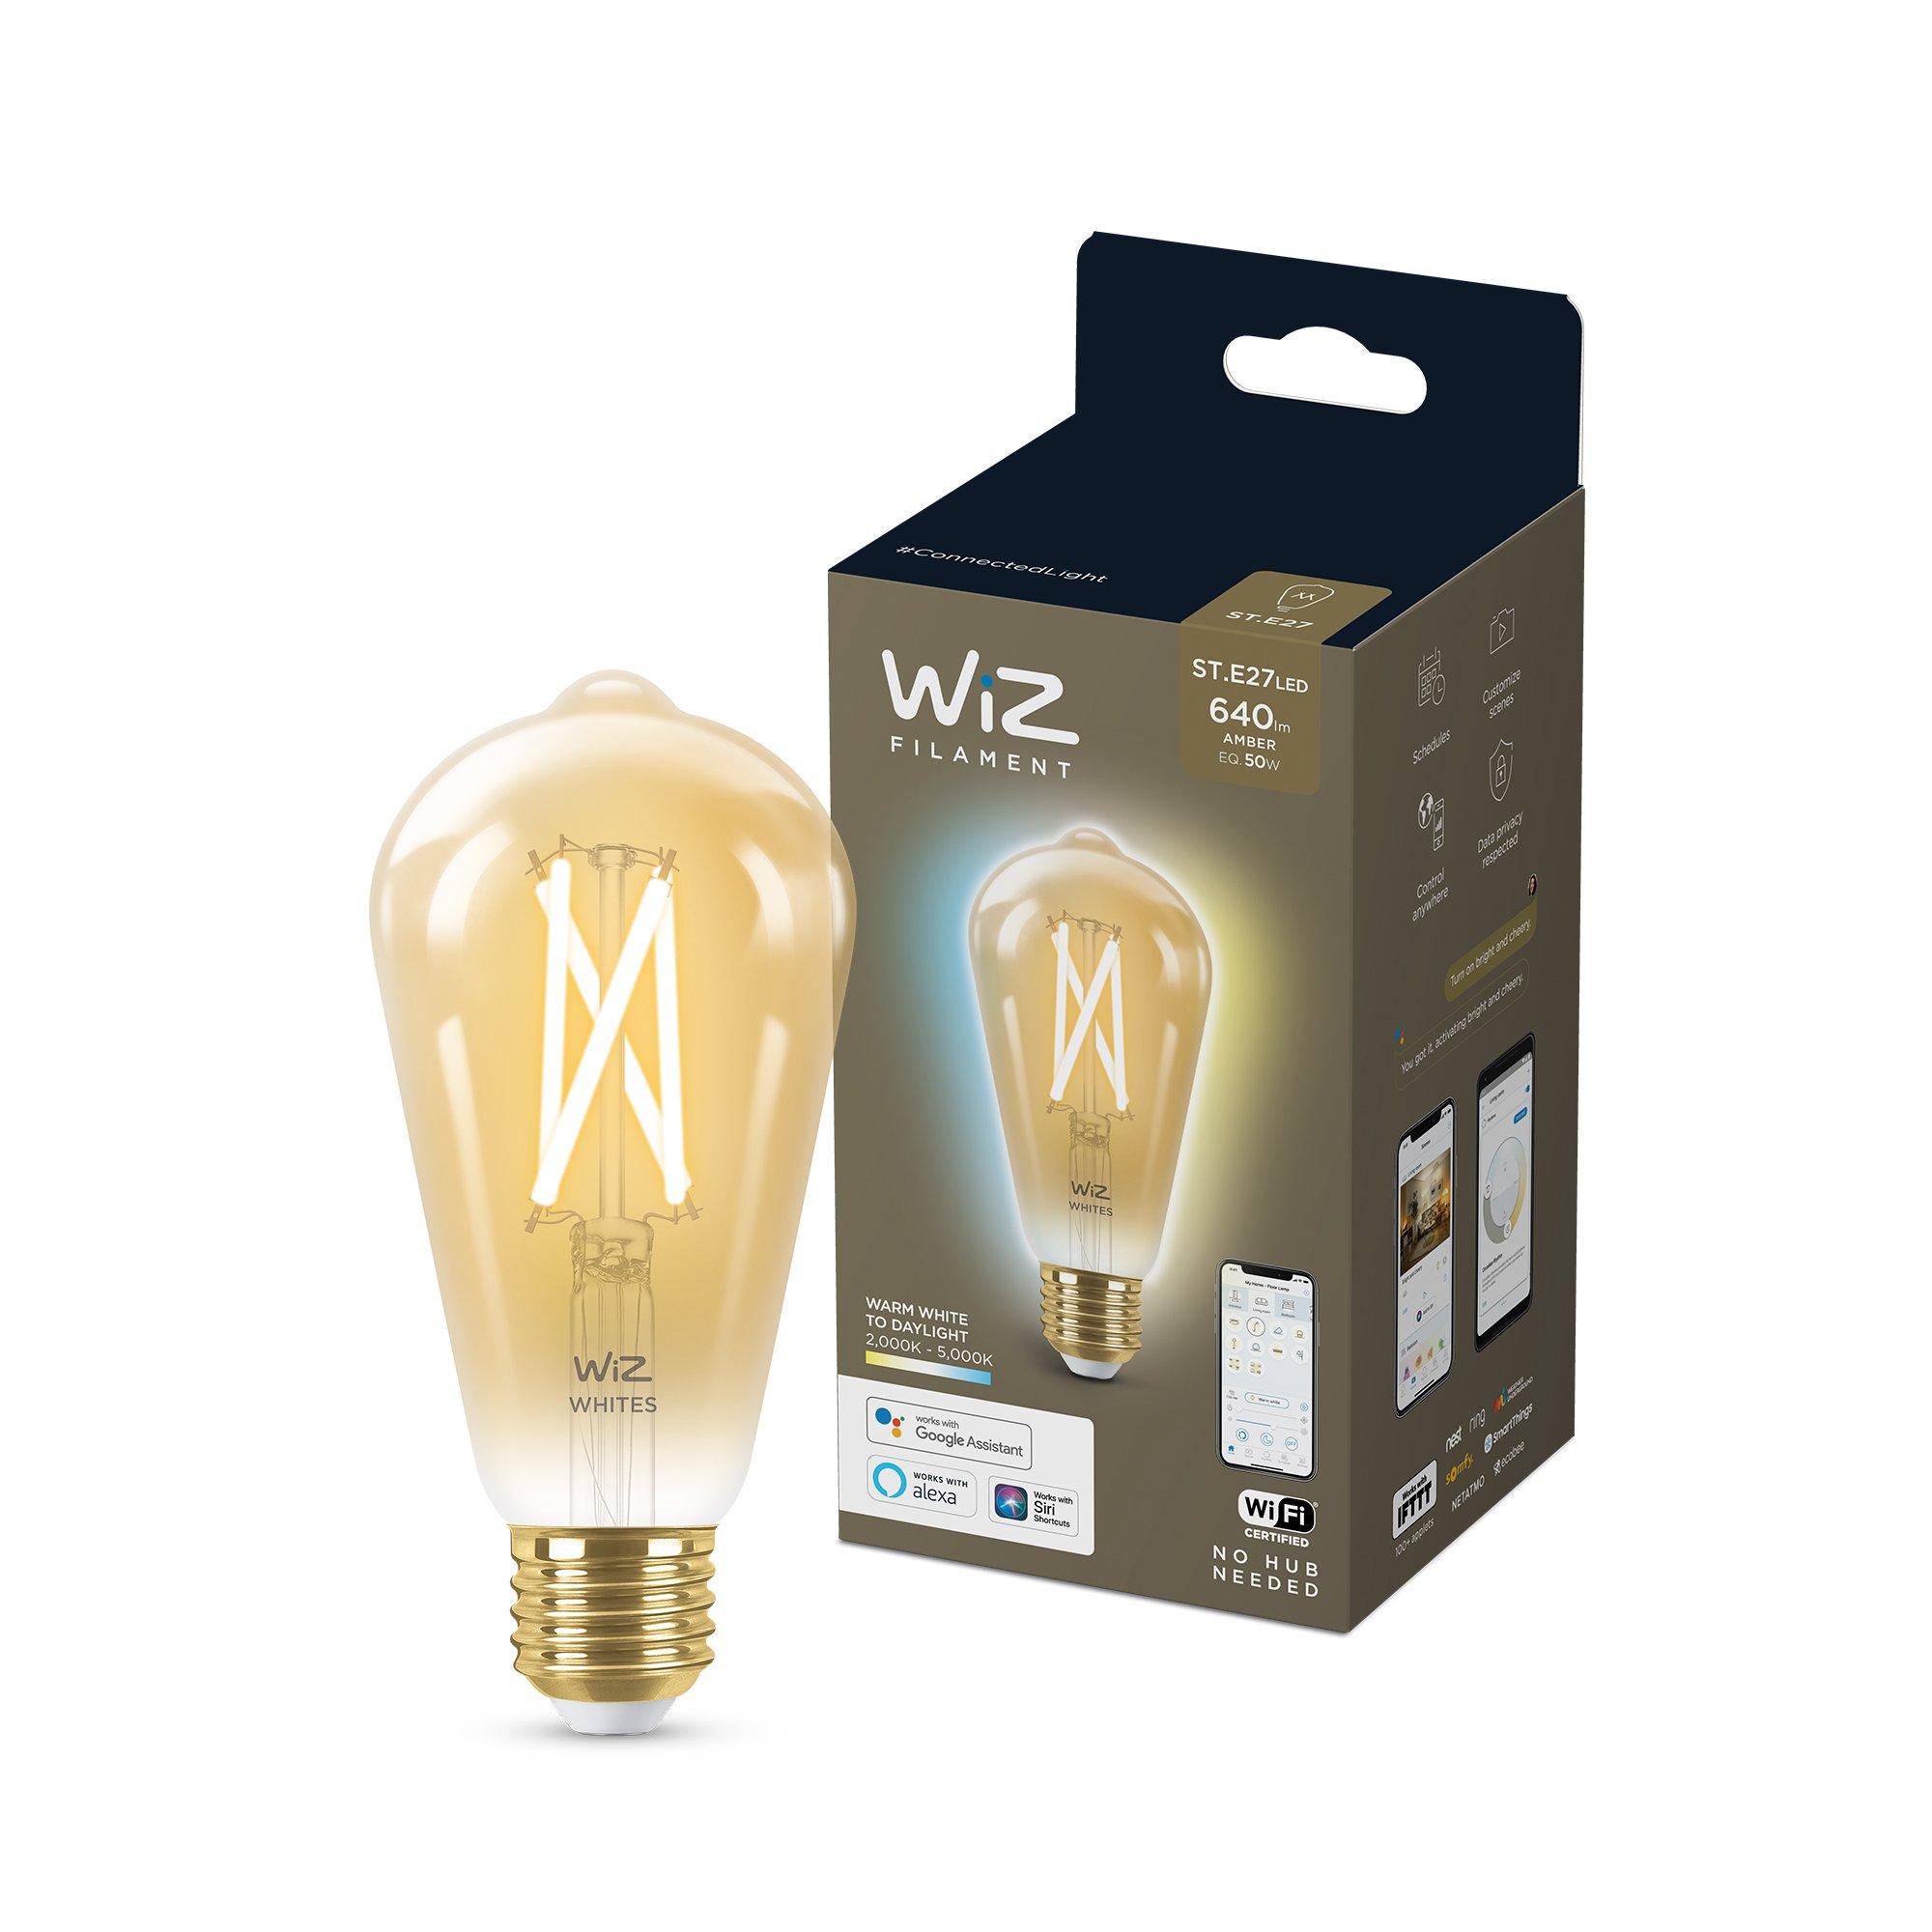 WiZ - ST64 Amber bulb E27 Tunable white - Smart Home